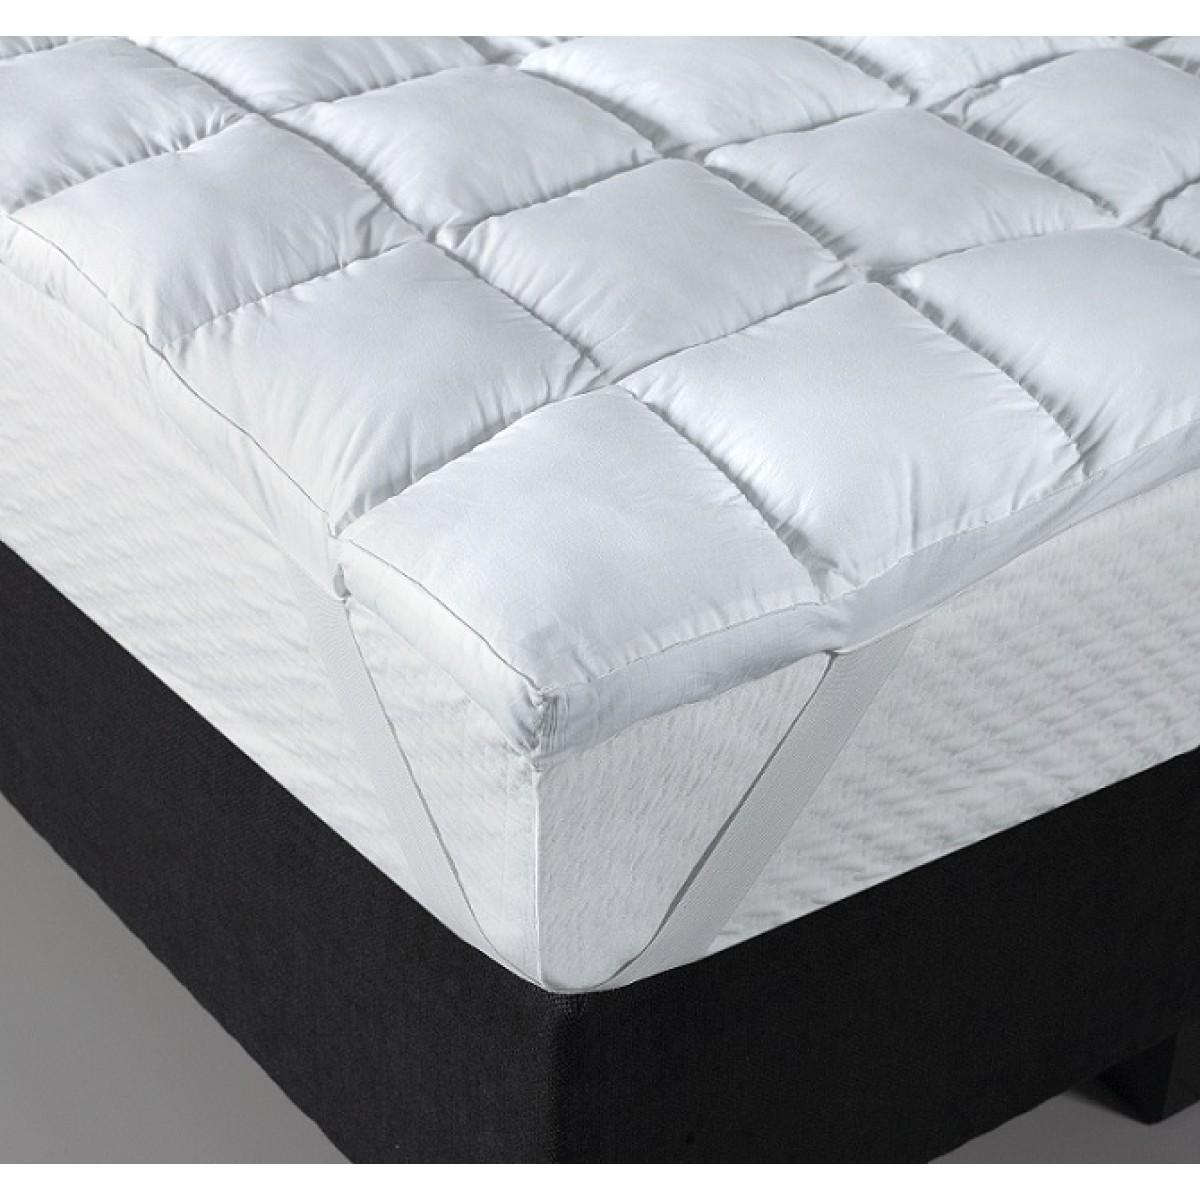 bultex surmatelas confort plus 160x200. Black Bedroom Furniture Sets. Home Design Ideas